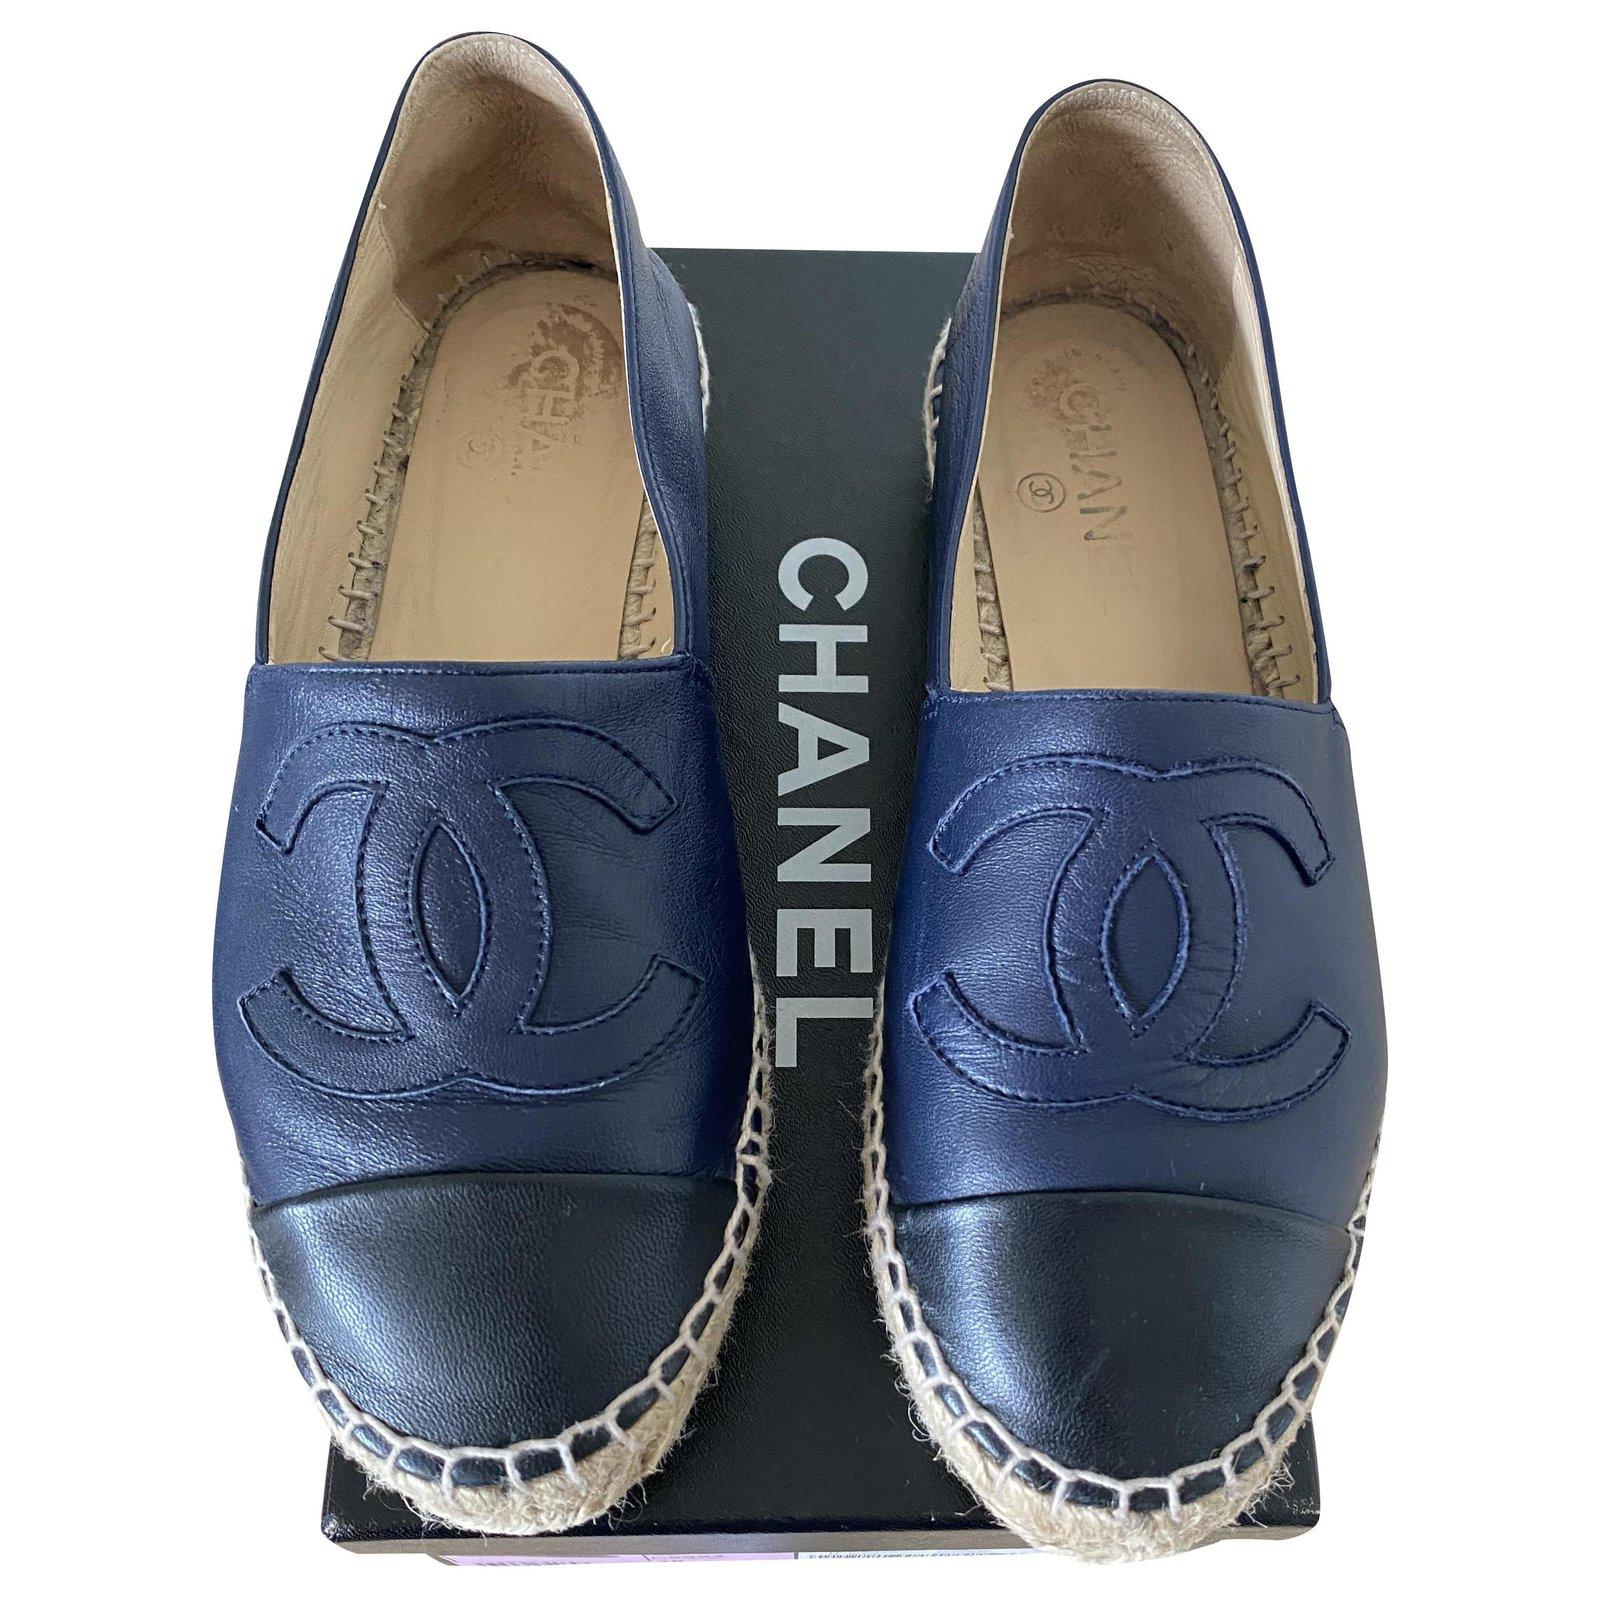 Chanel Espadrilles Espadrilles Leather